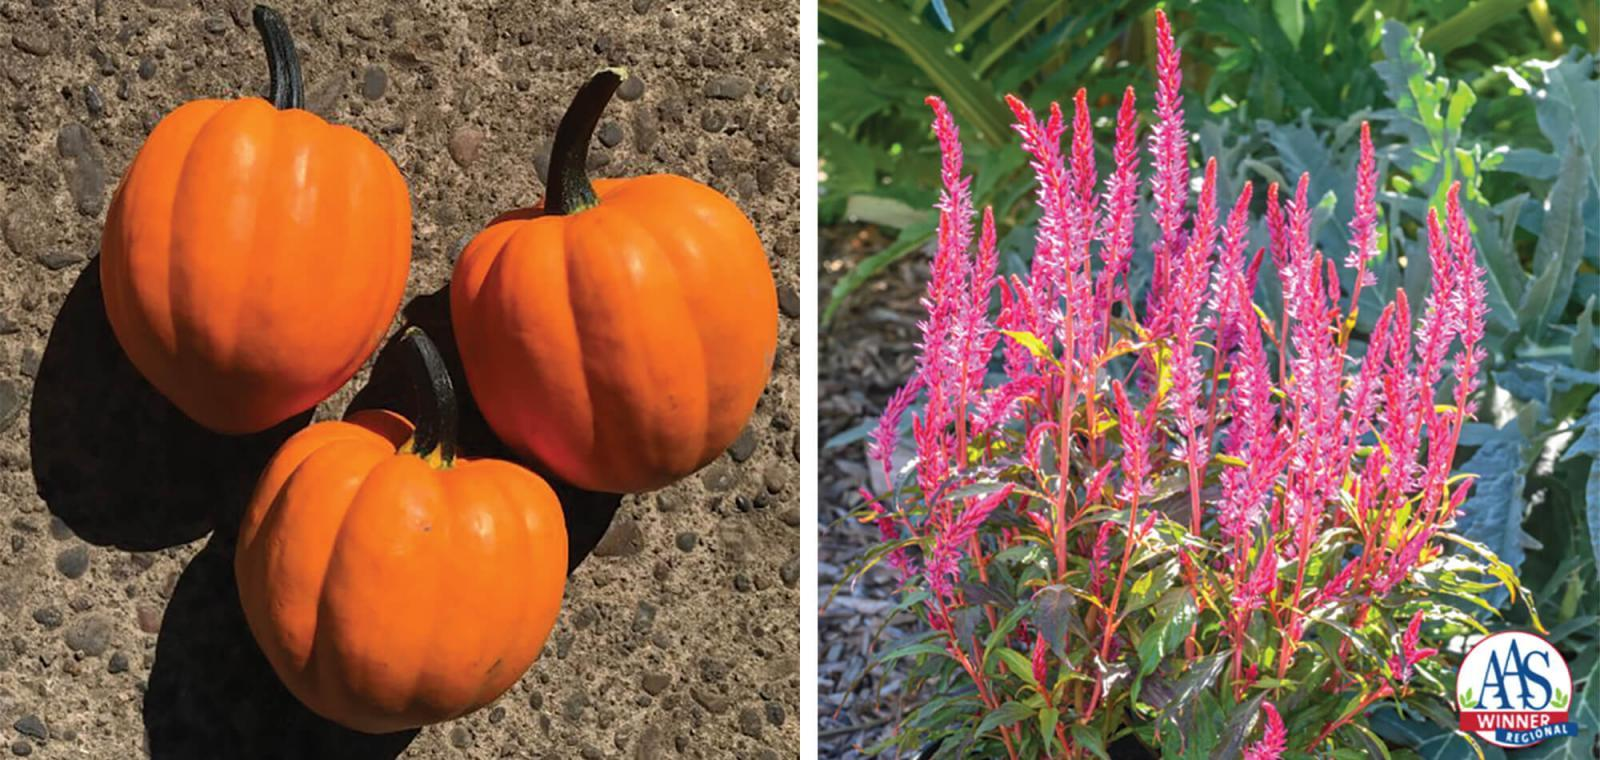 AAS fetes celosia and squash cultivars